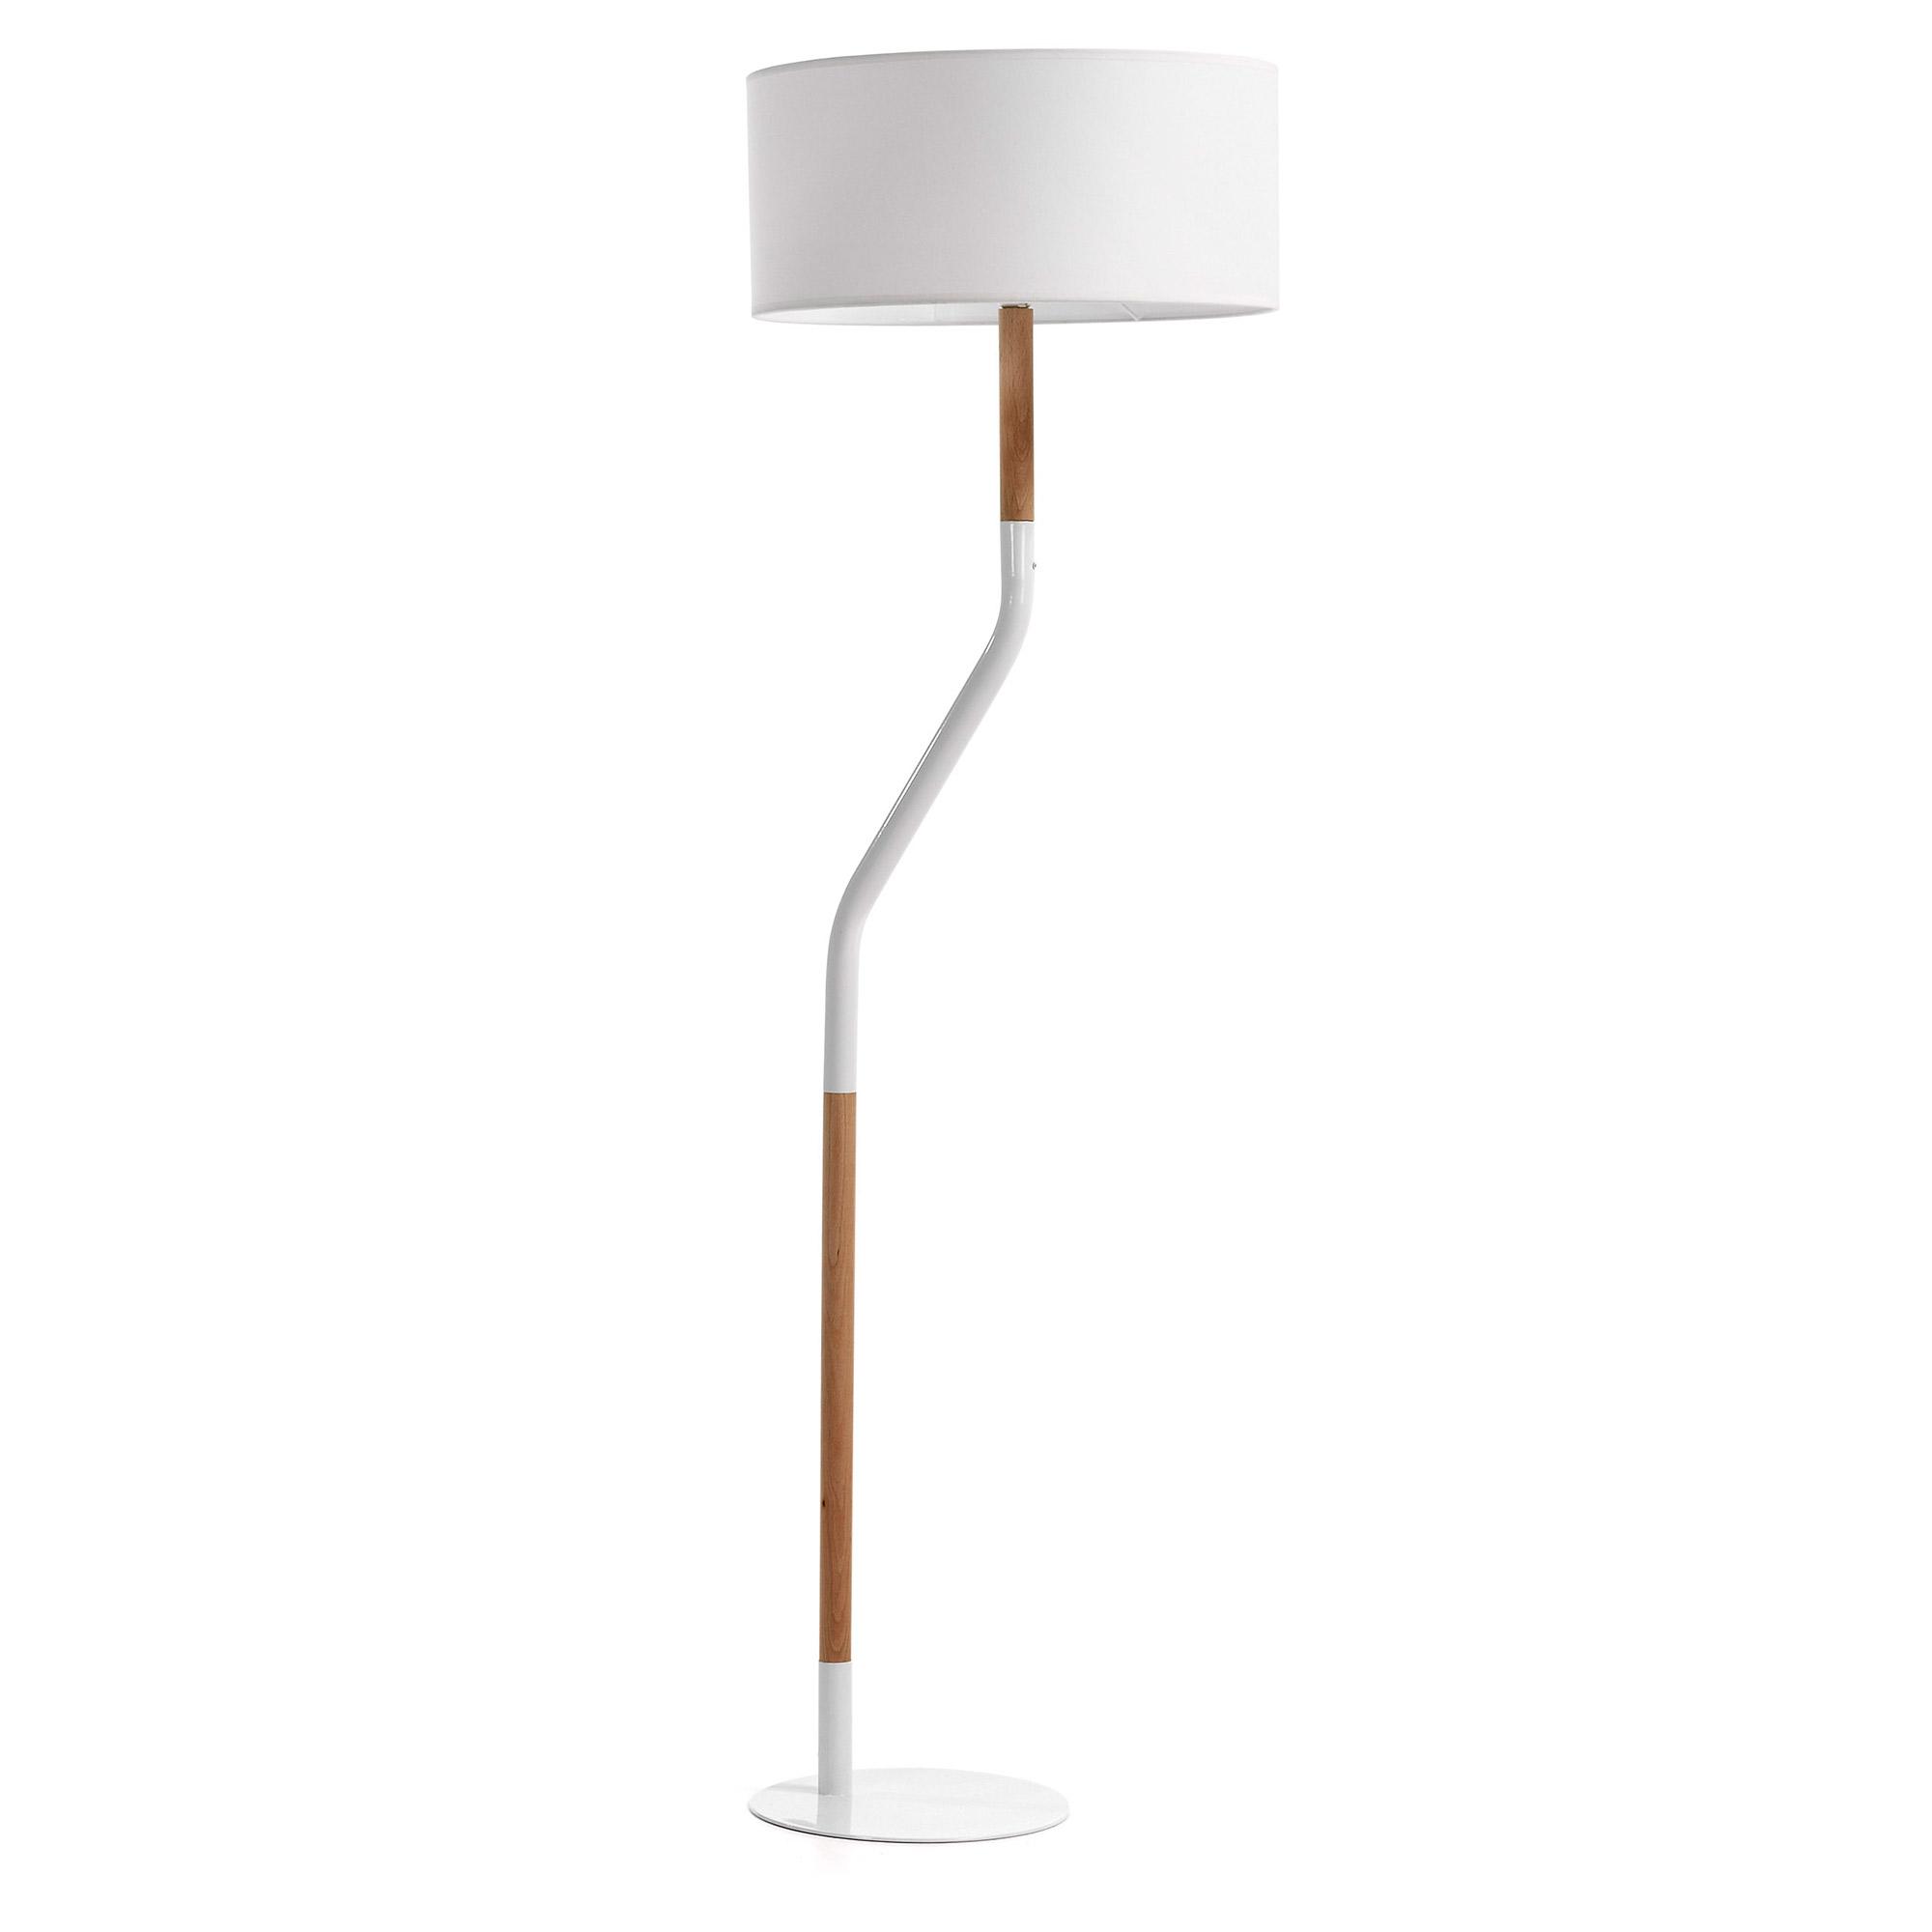 Kave Home Vloerlamp 'Leroca', kleur wit